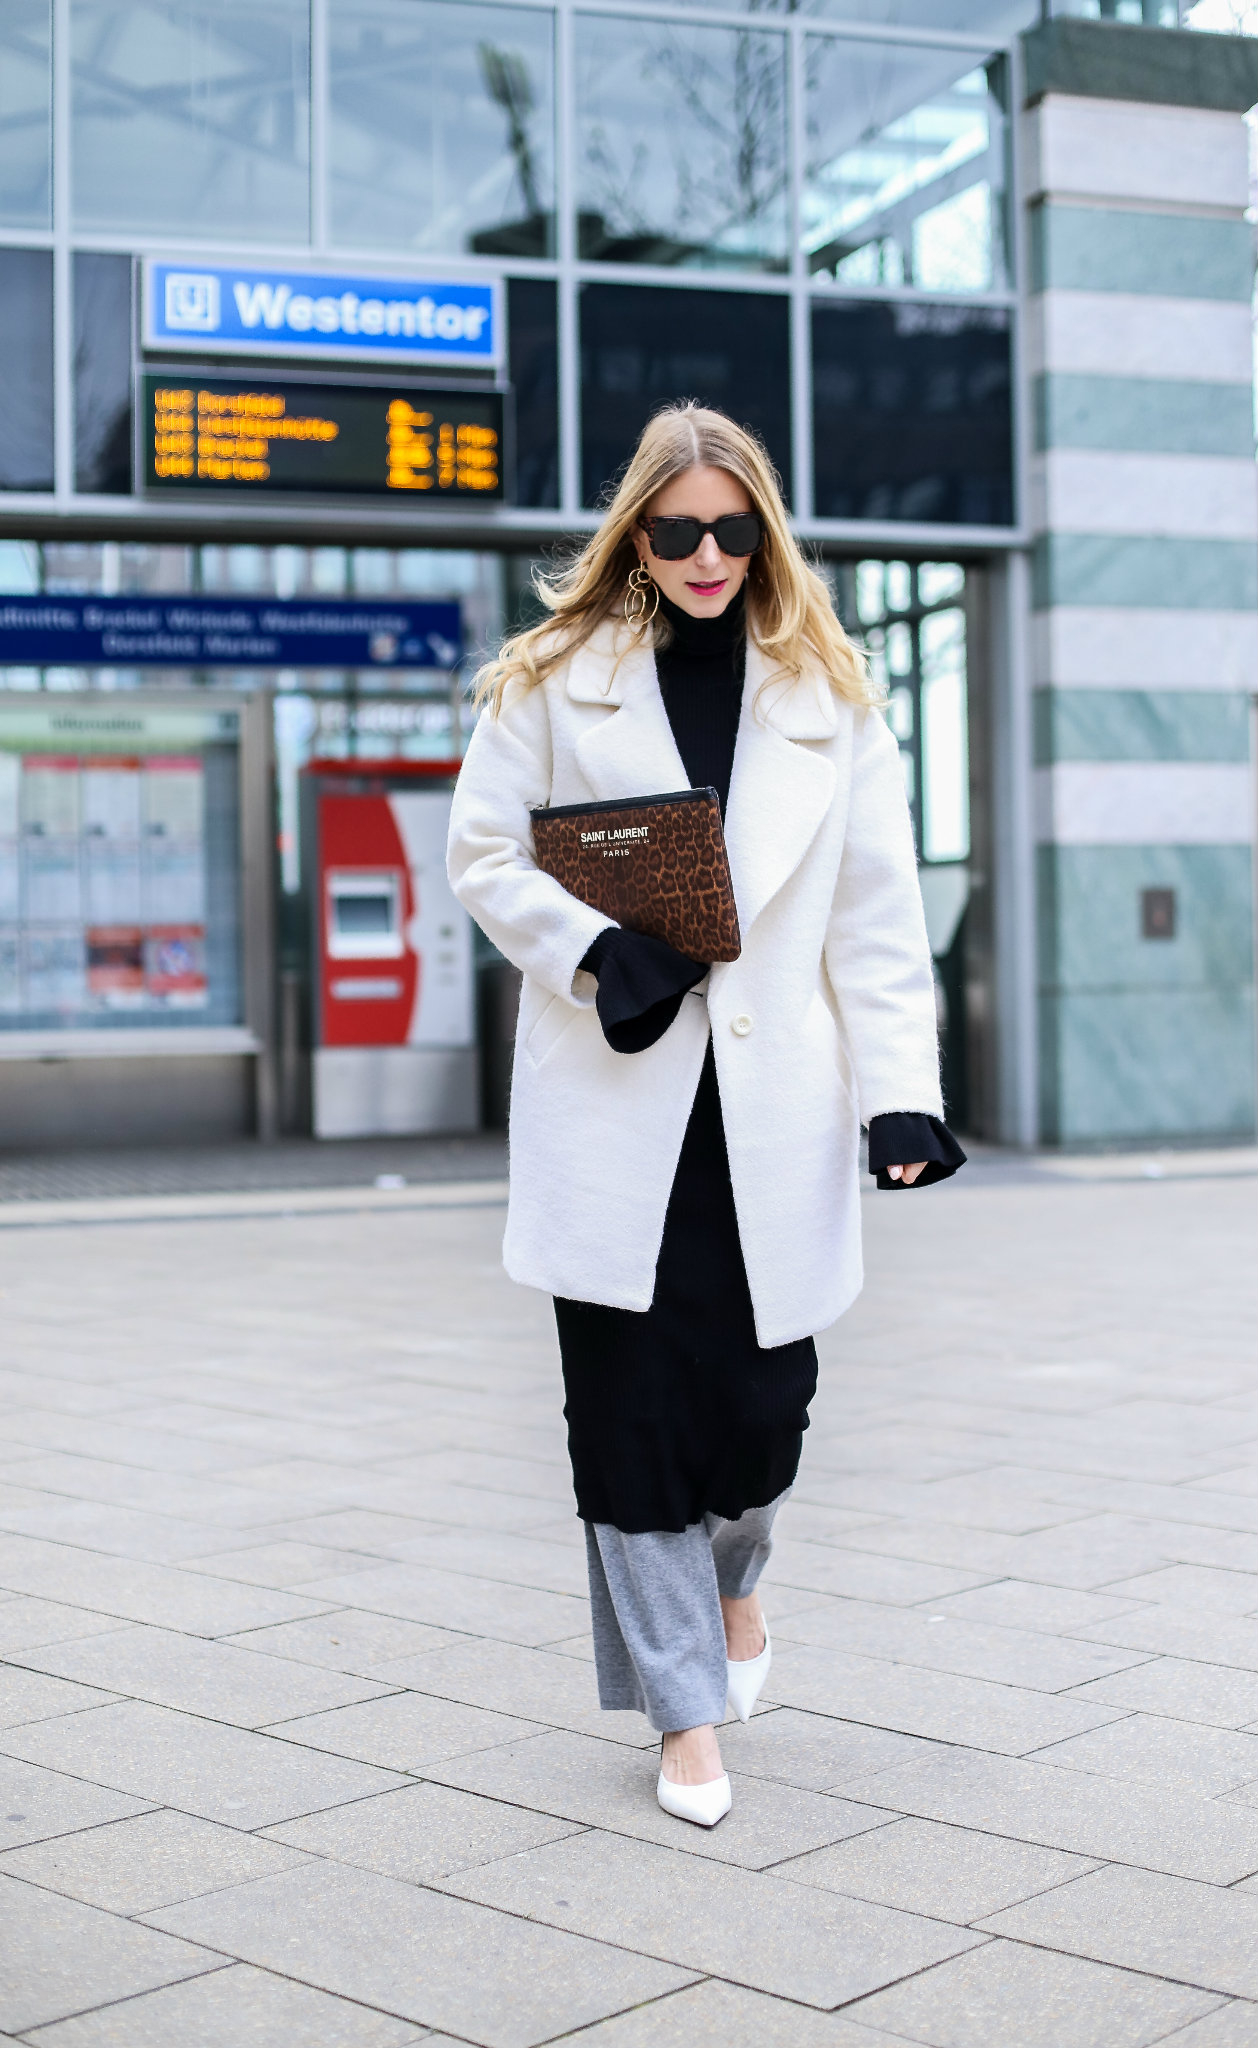 MOD-by-Monique-Fashion-Looks-Neutral-Layers-29